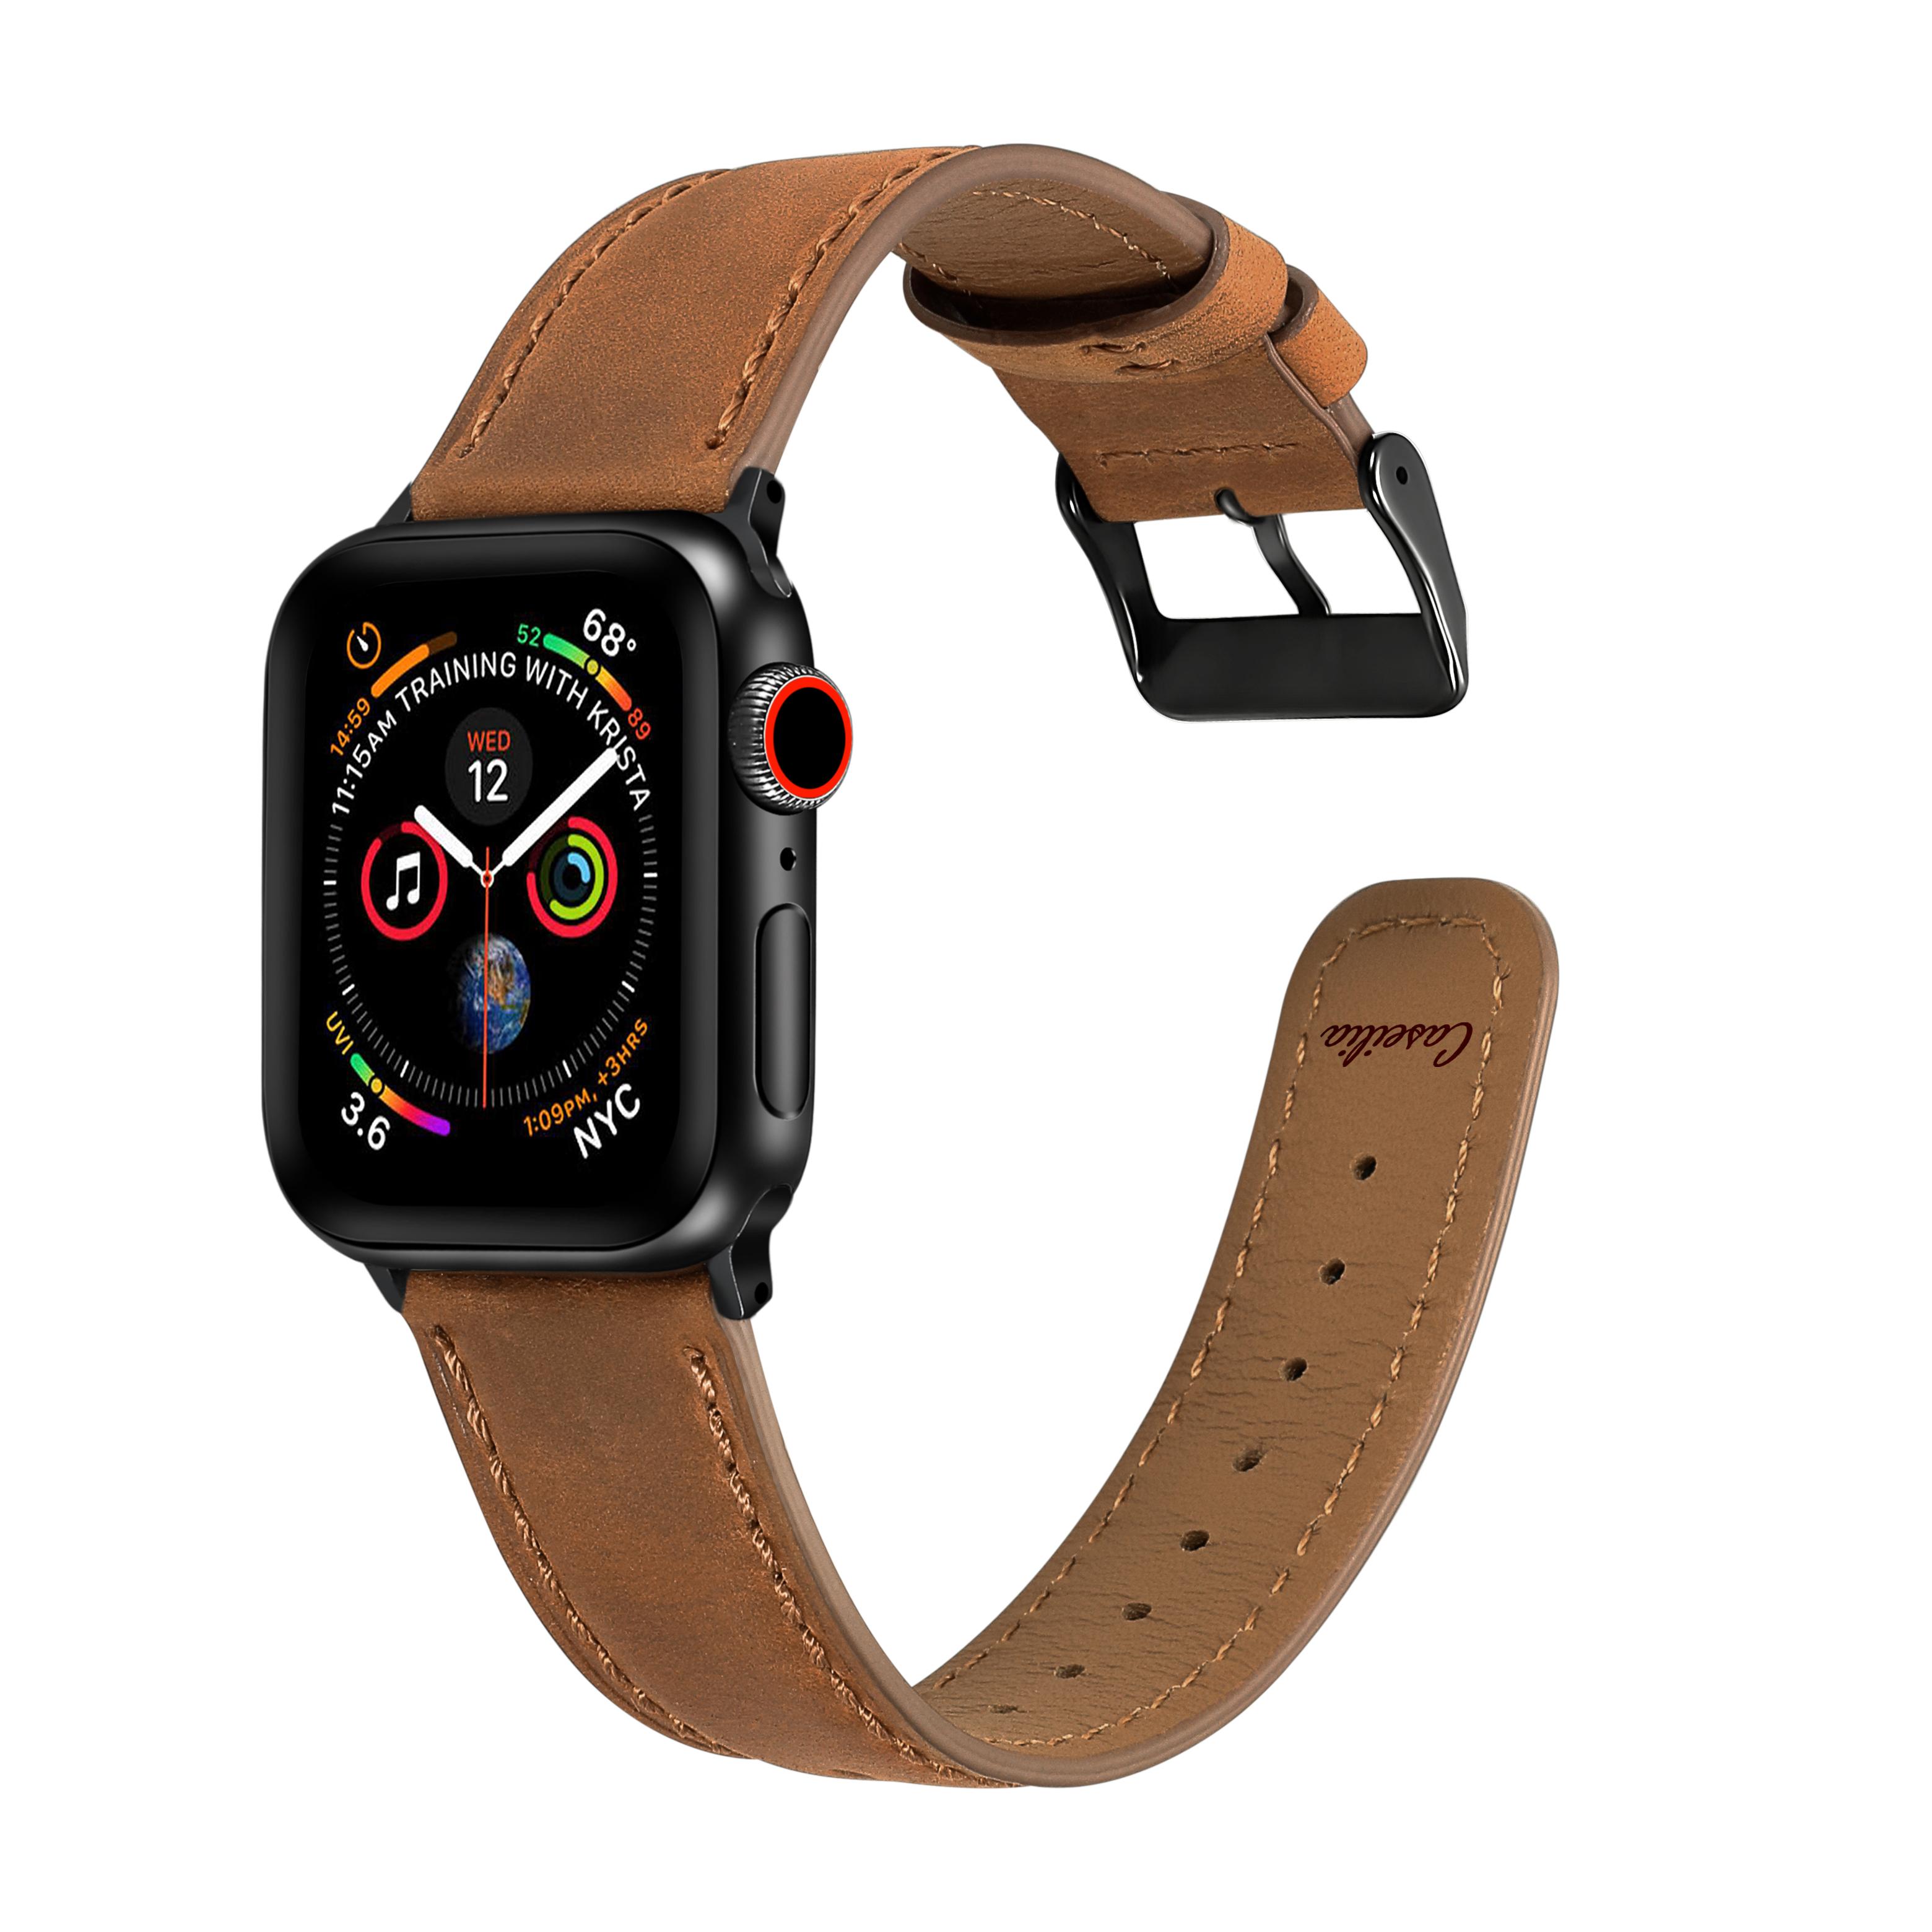 Caseilia Apple Watch_MORGAN (5)